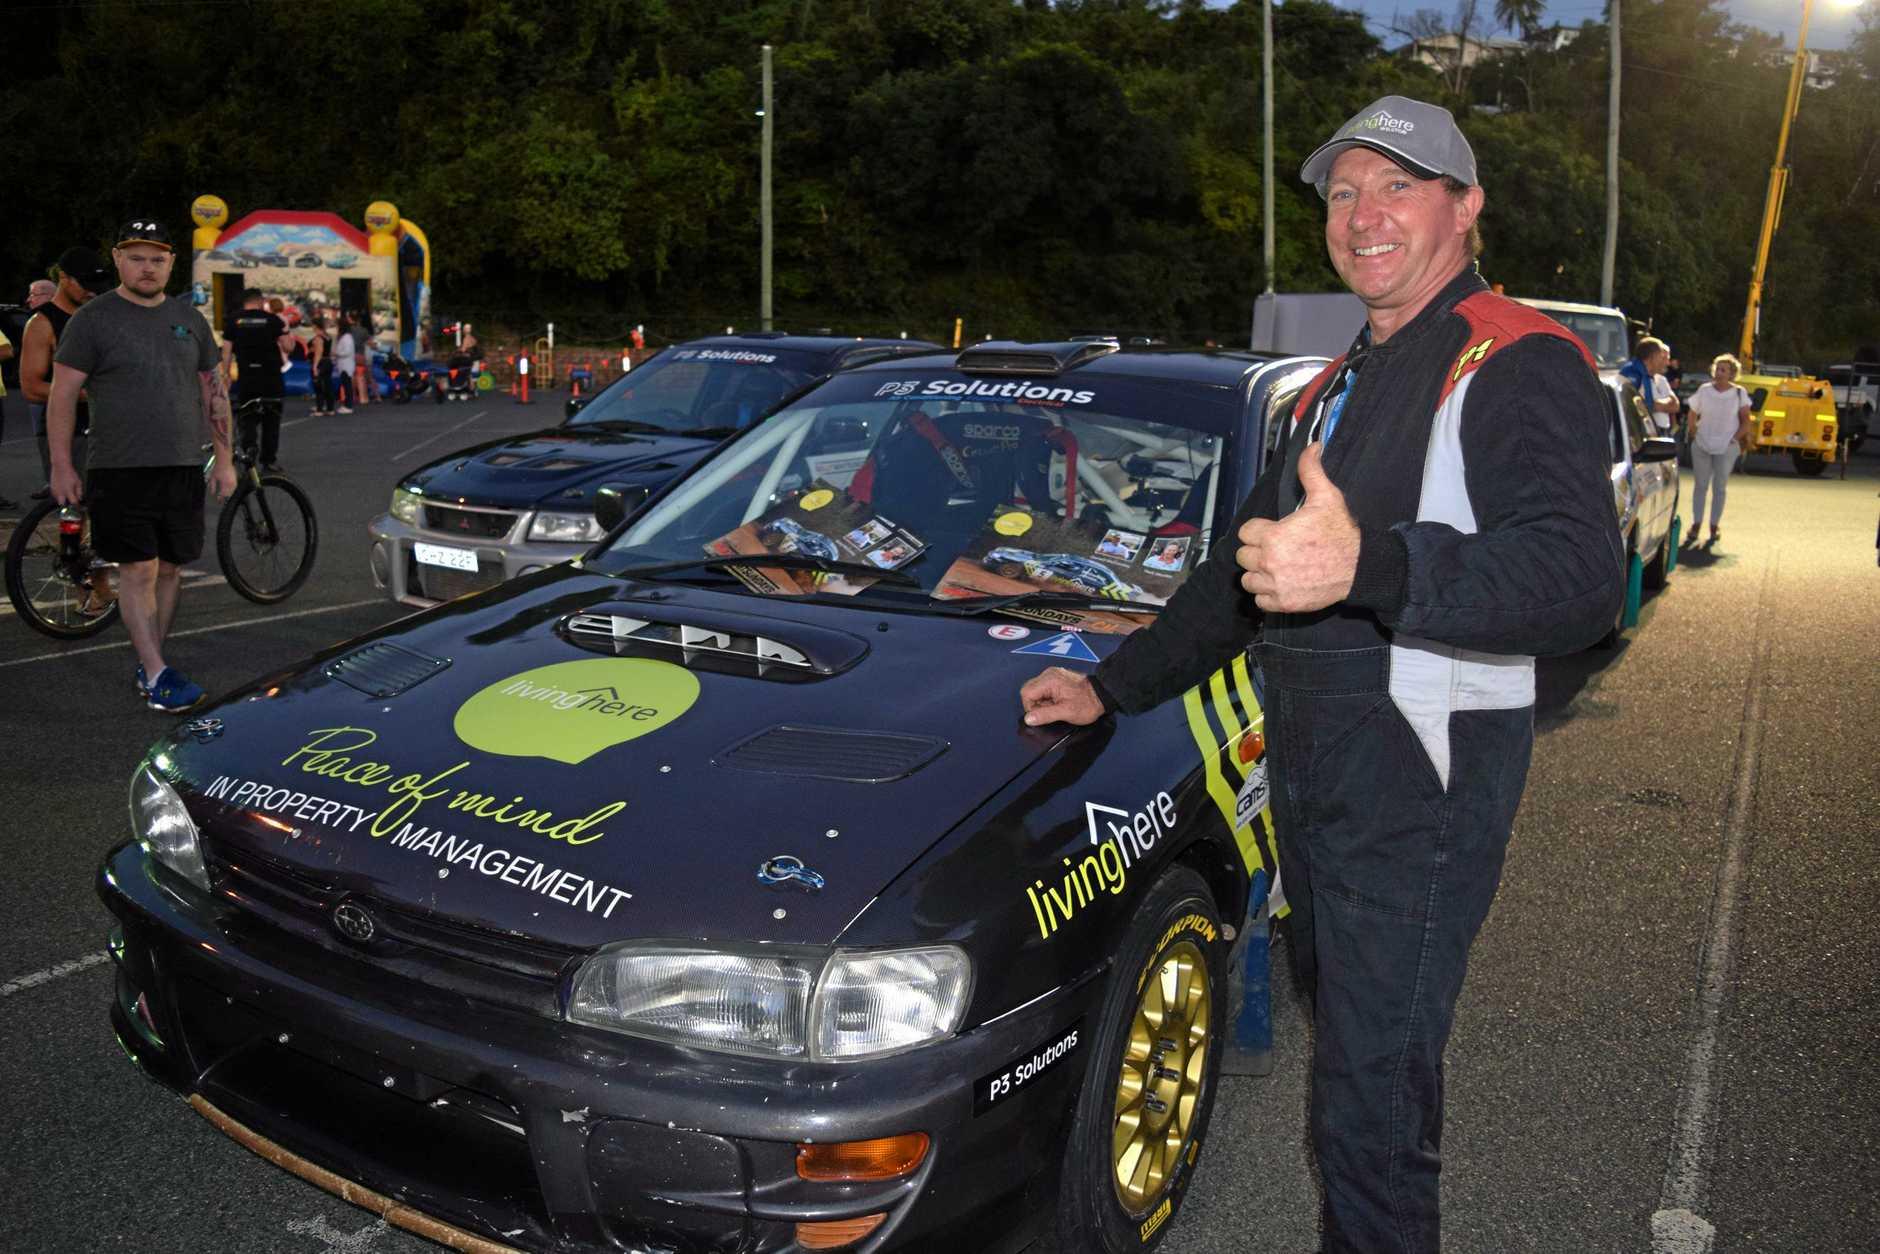 Rally competitor Brisbane's Gerard McConkey shows off his 1999 Subaru WRX during last Friday night's festivities.